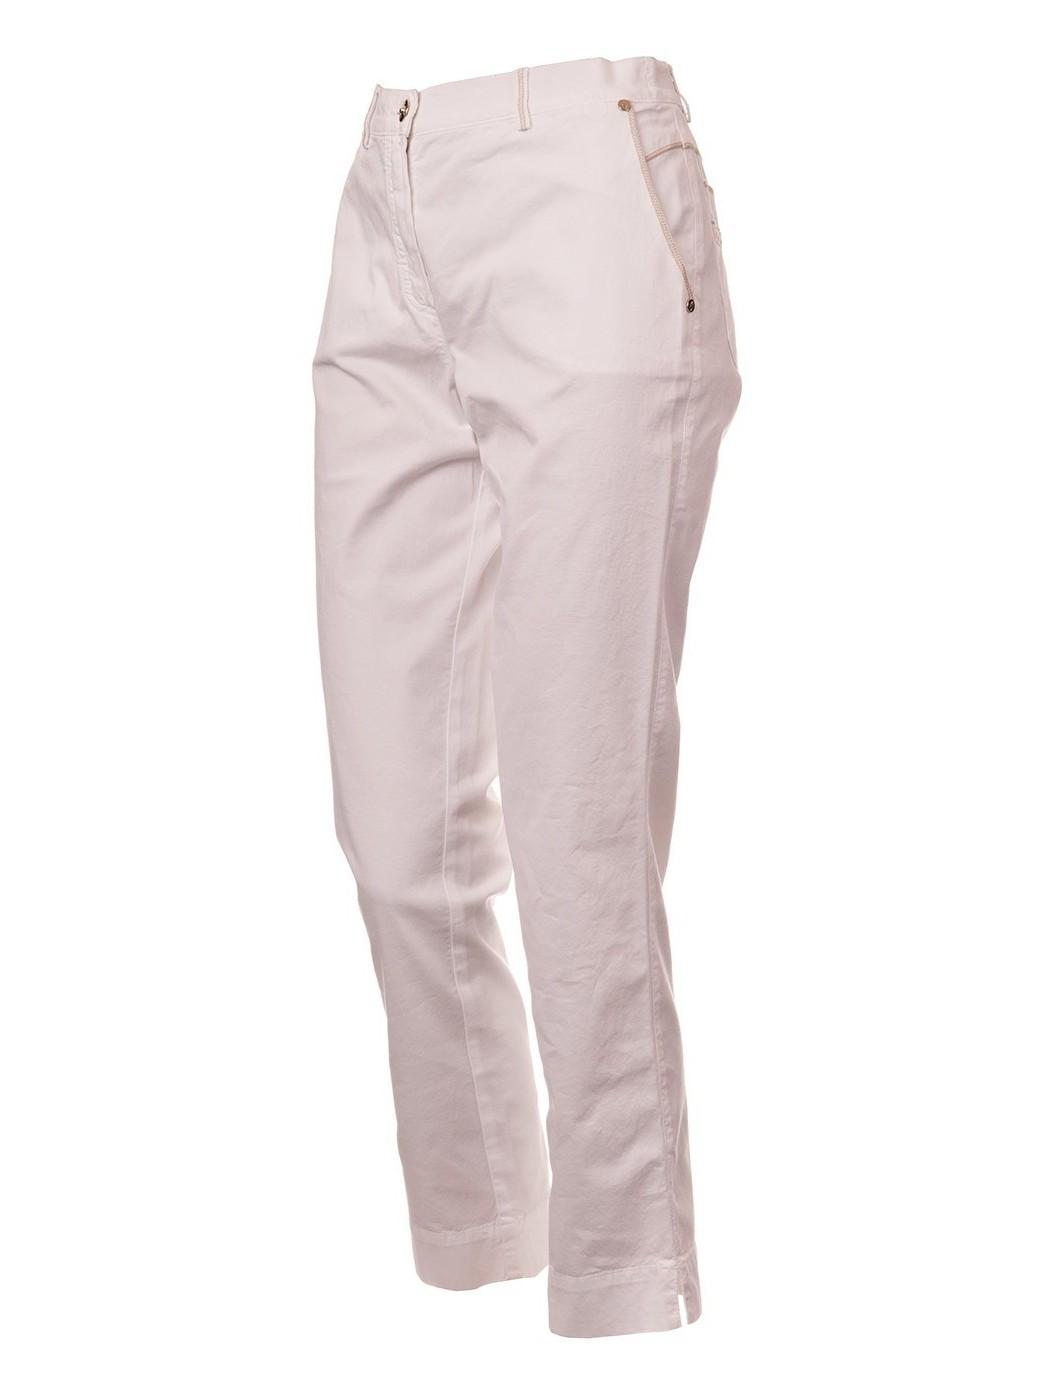 White capri pants